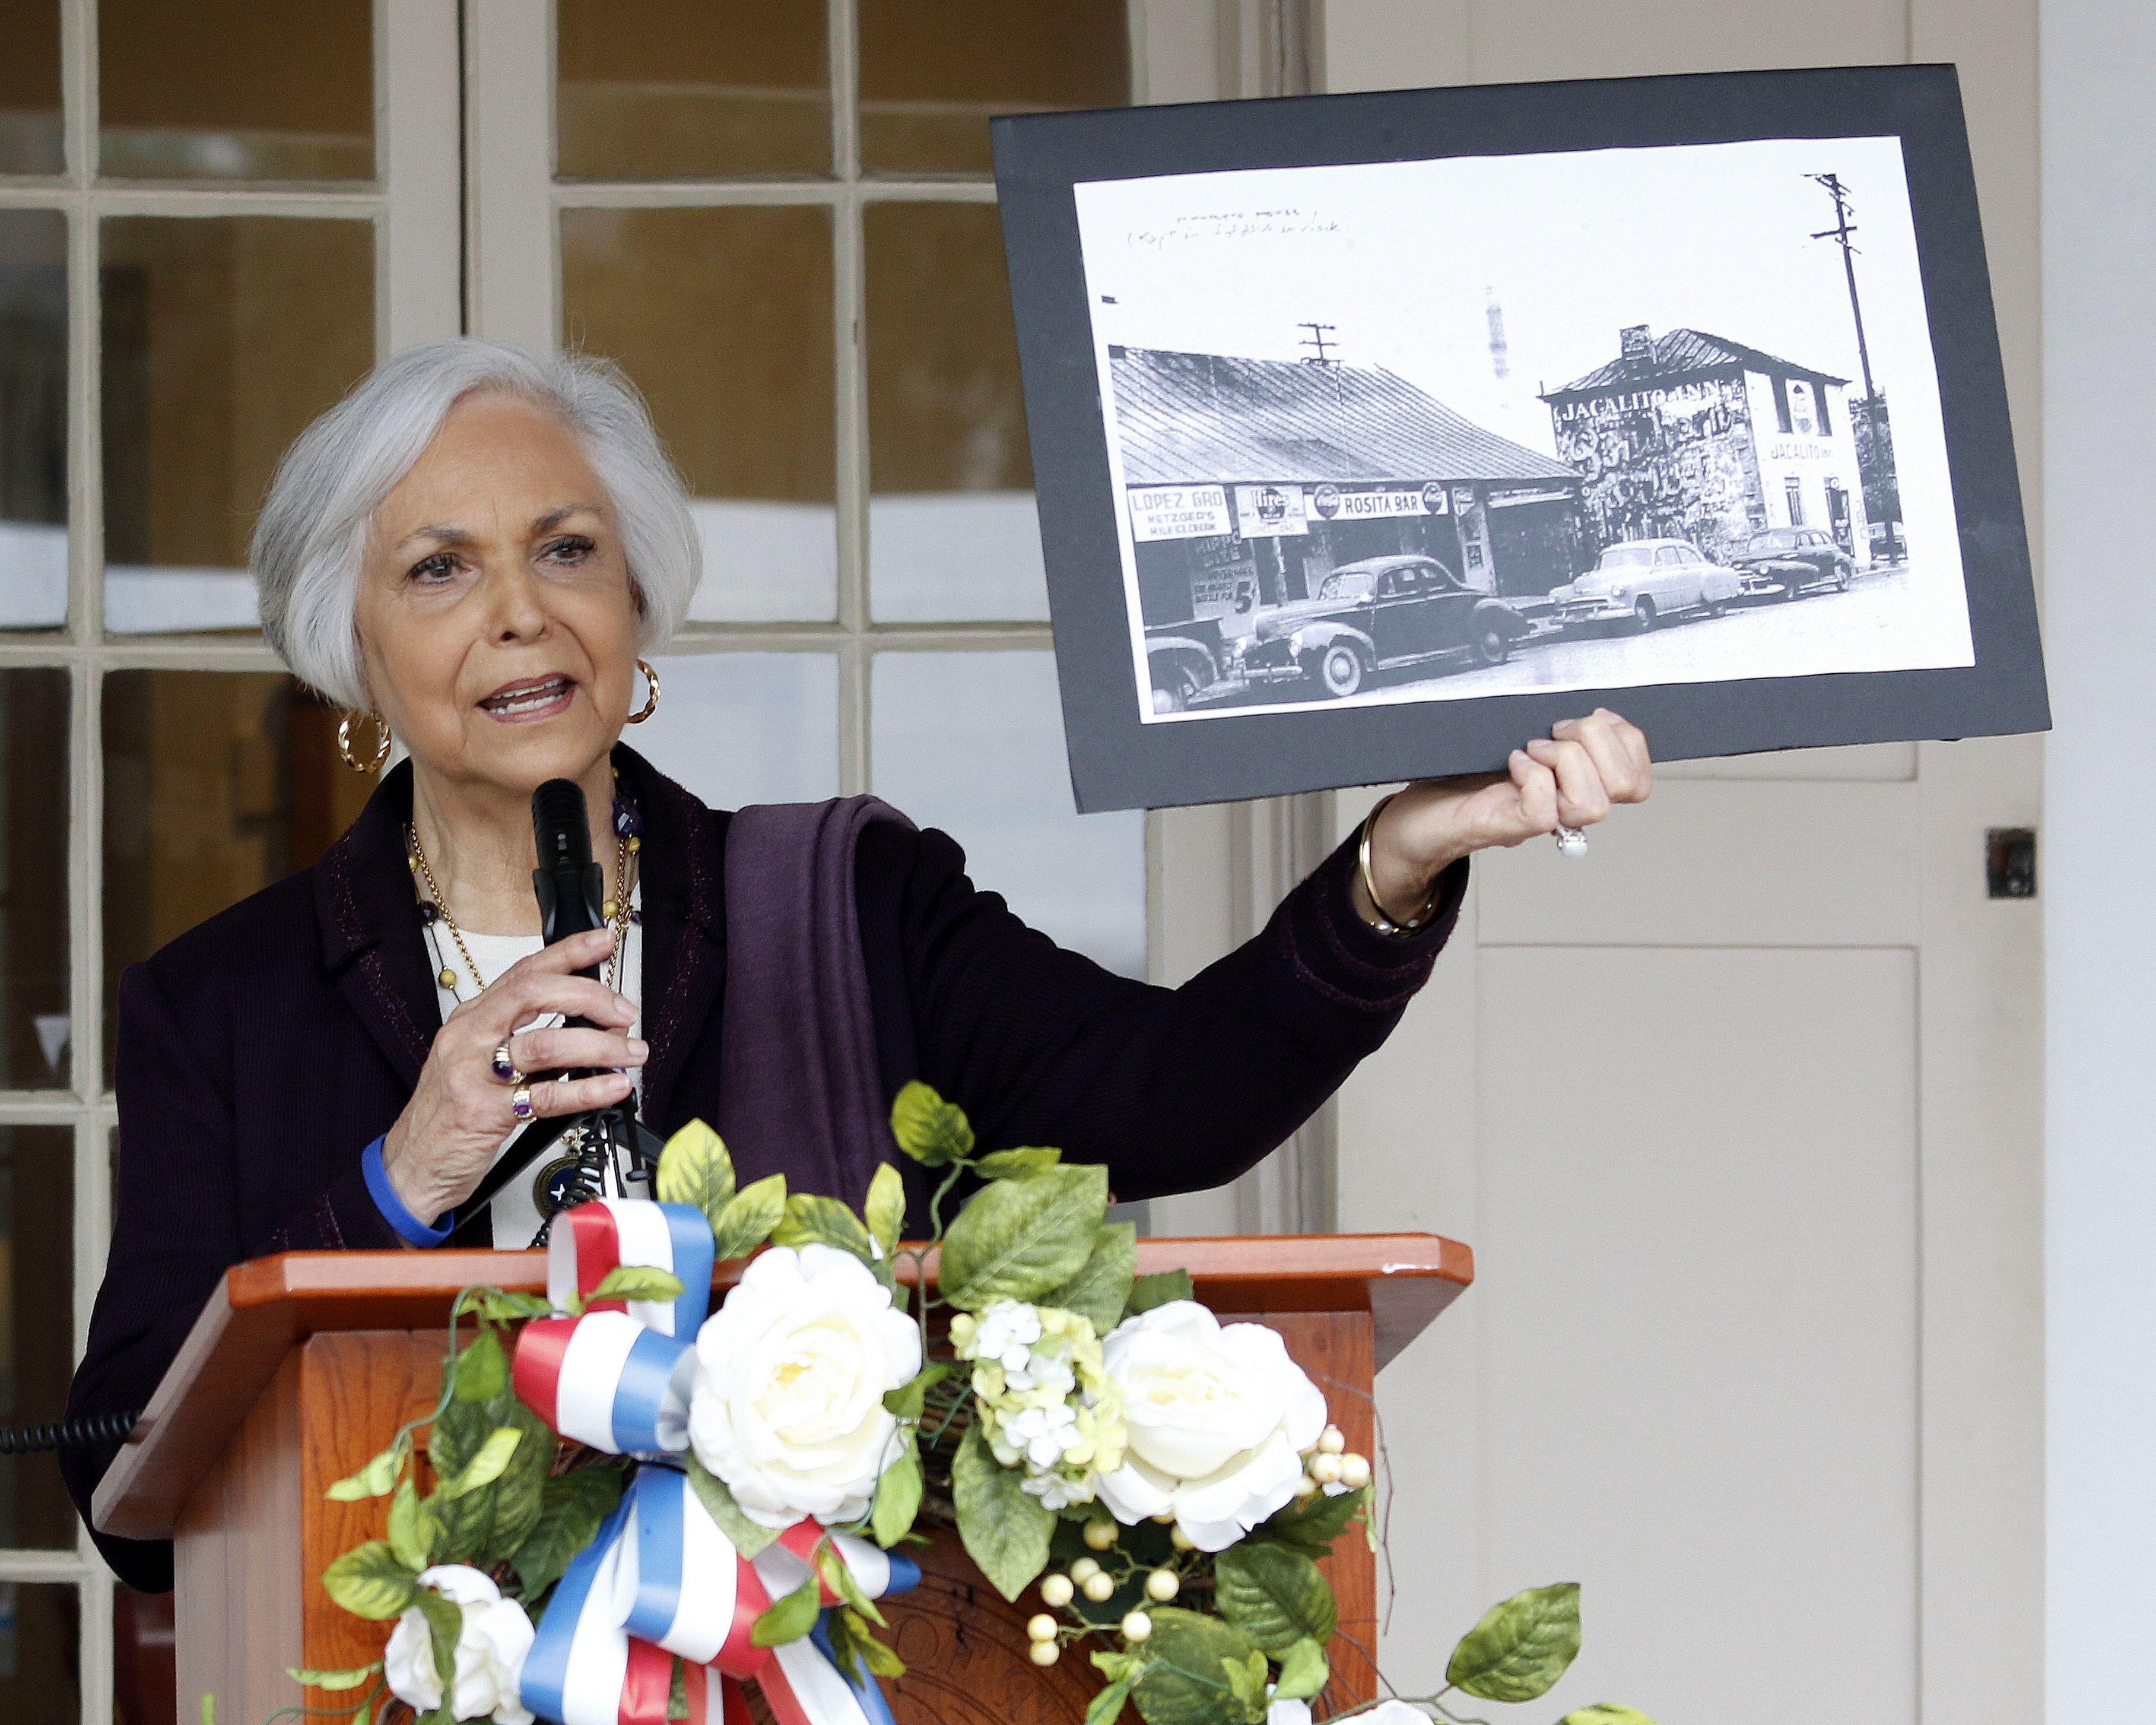 Family History Unlocks Love for Preservation: A Talk with Sylvia Tillotson